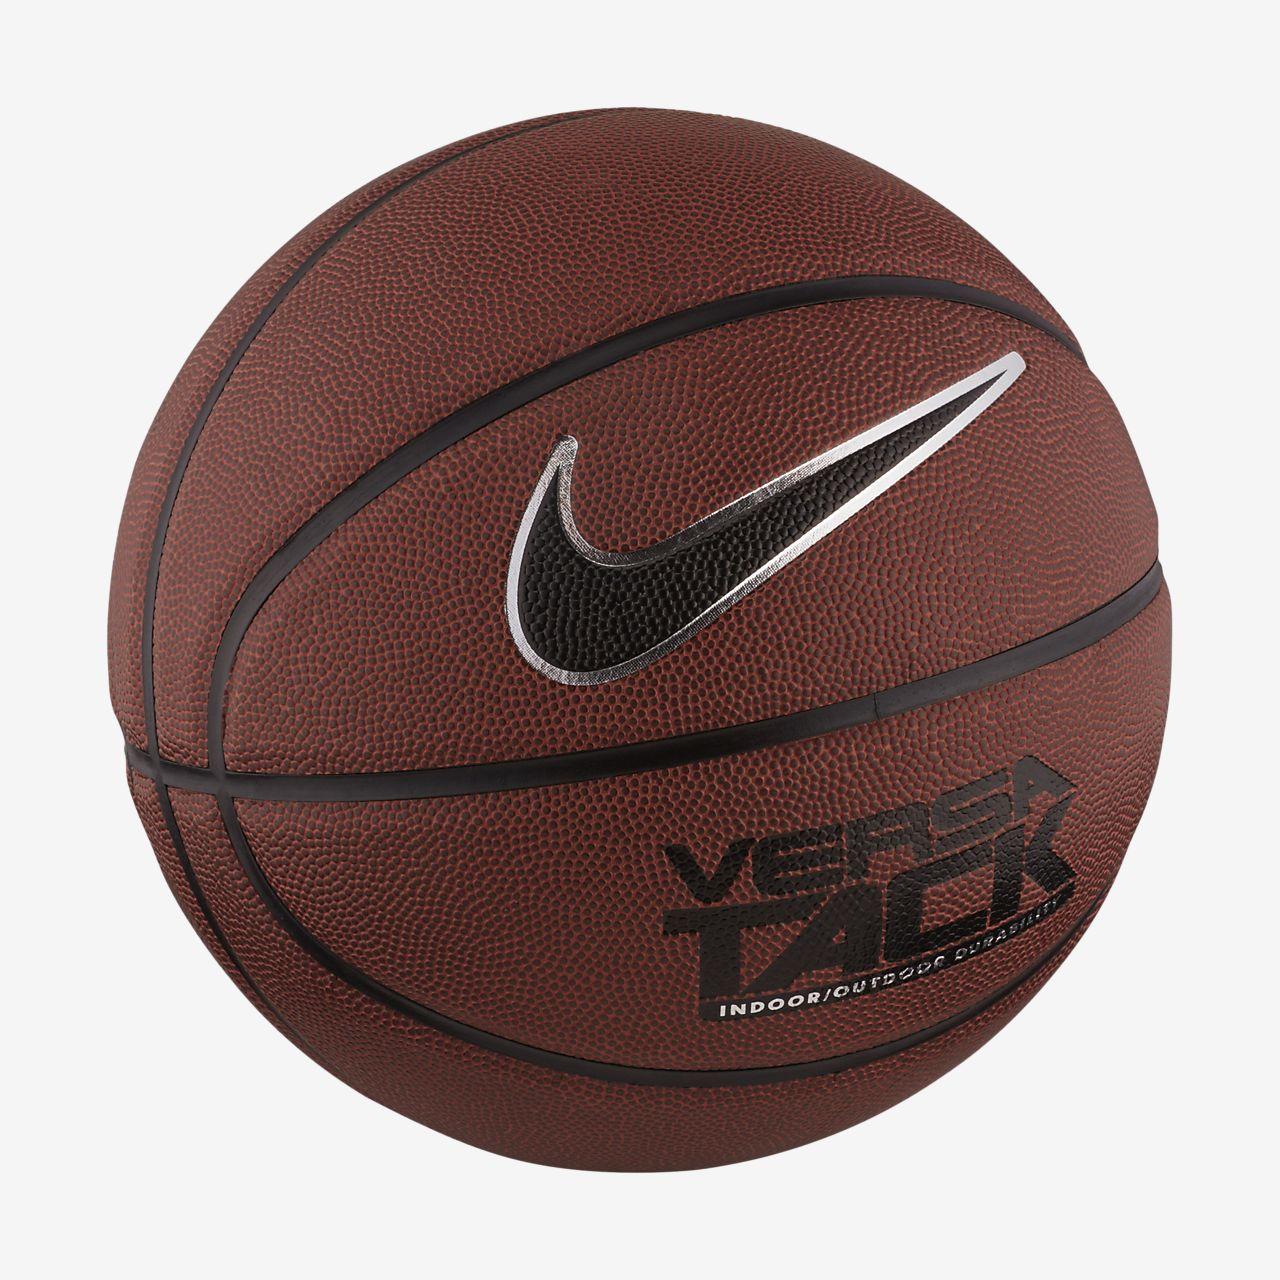 new style 66f90 71ae2 Basketball. Nike Versa Tack 8P